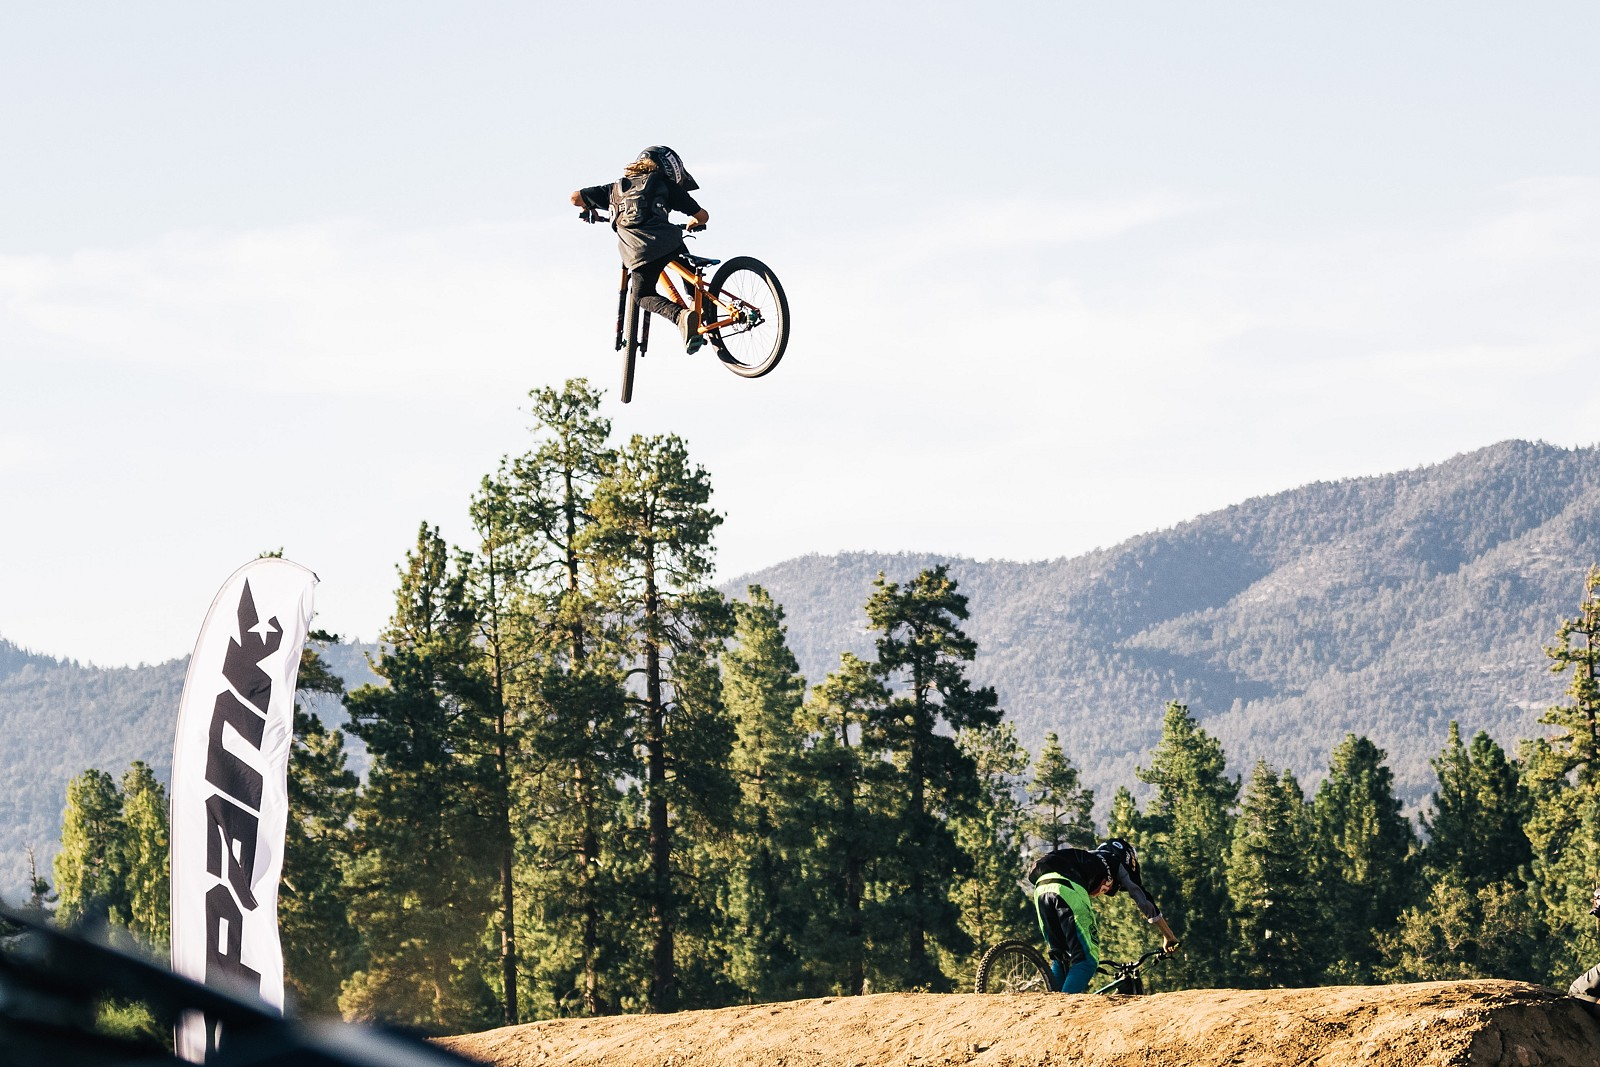 2019USOpenMTBWhip yellow-7 - ALeedomPhotography - Mountain Biking Pictures - Vital MTB